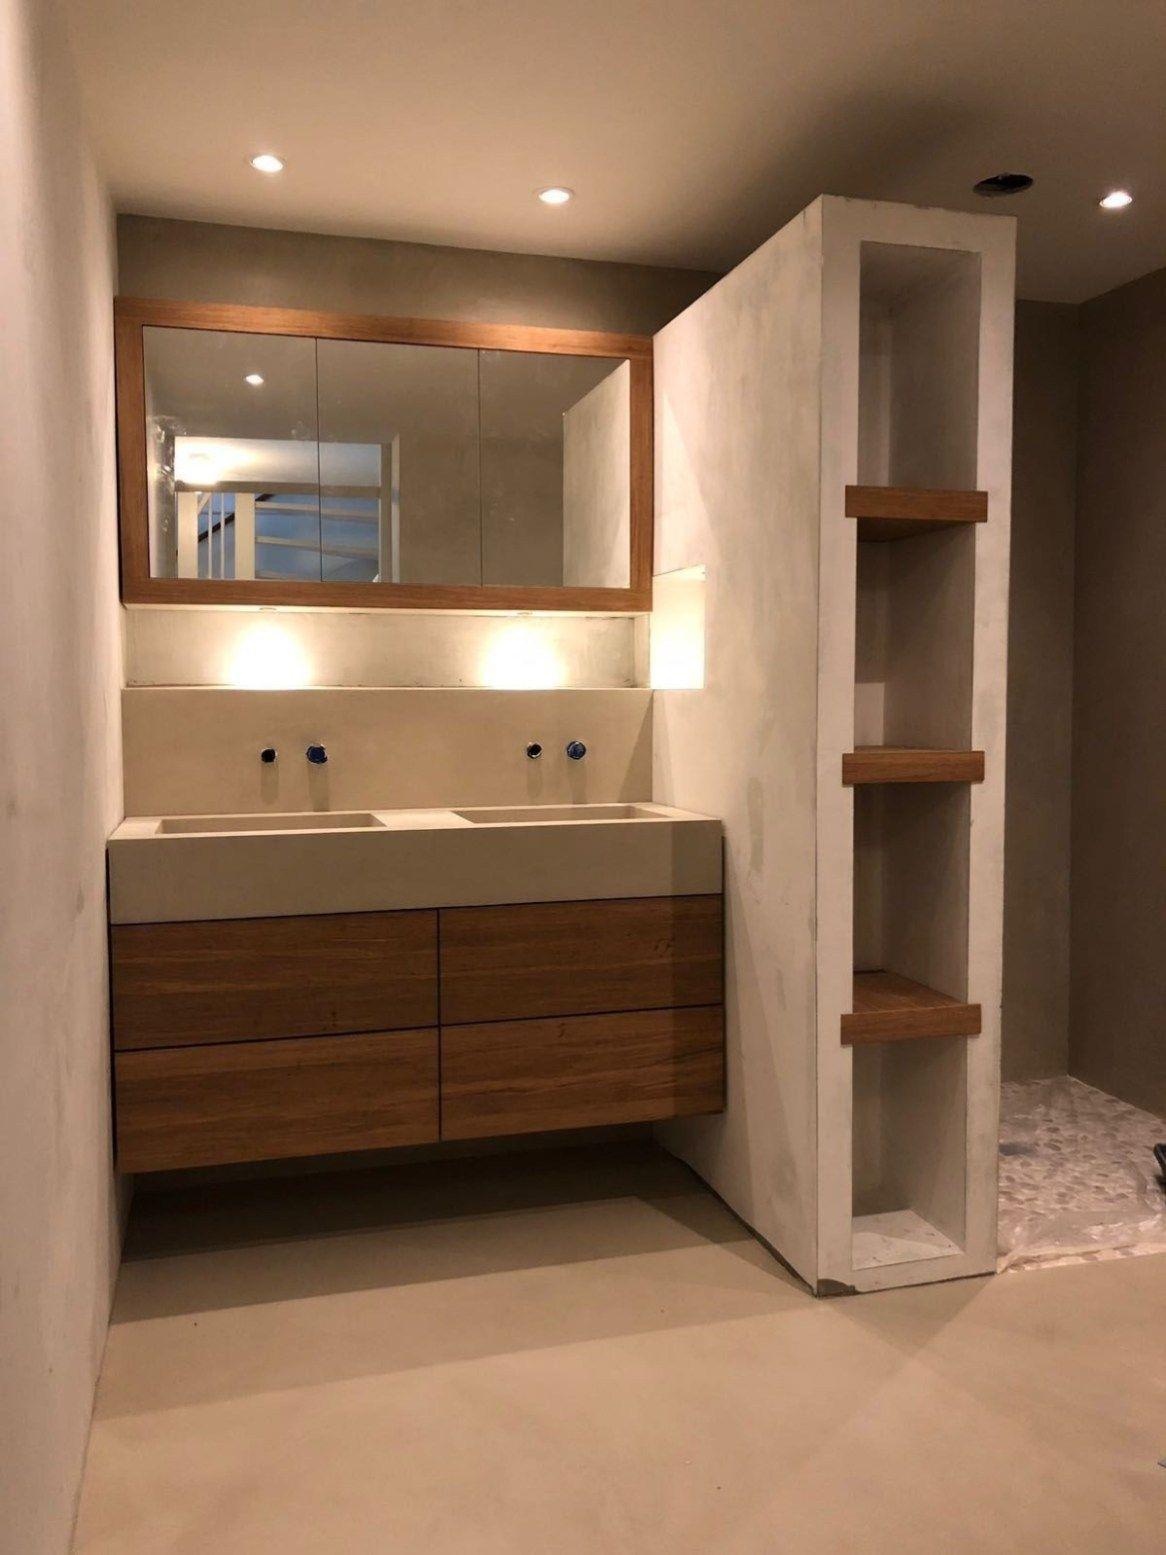 Photo of 41 Enchanting Bathroom Storage Ideas For Your Organization – ZYHOMY #smallbathroomstorage